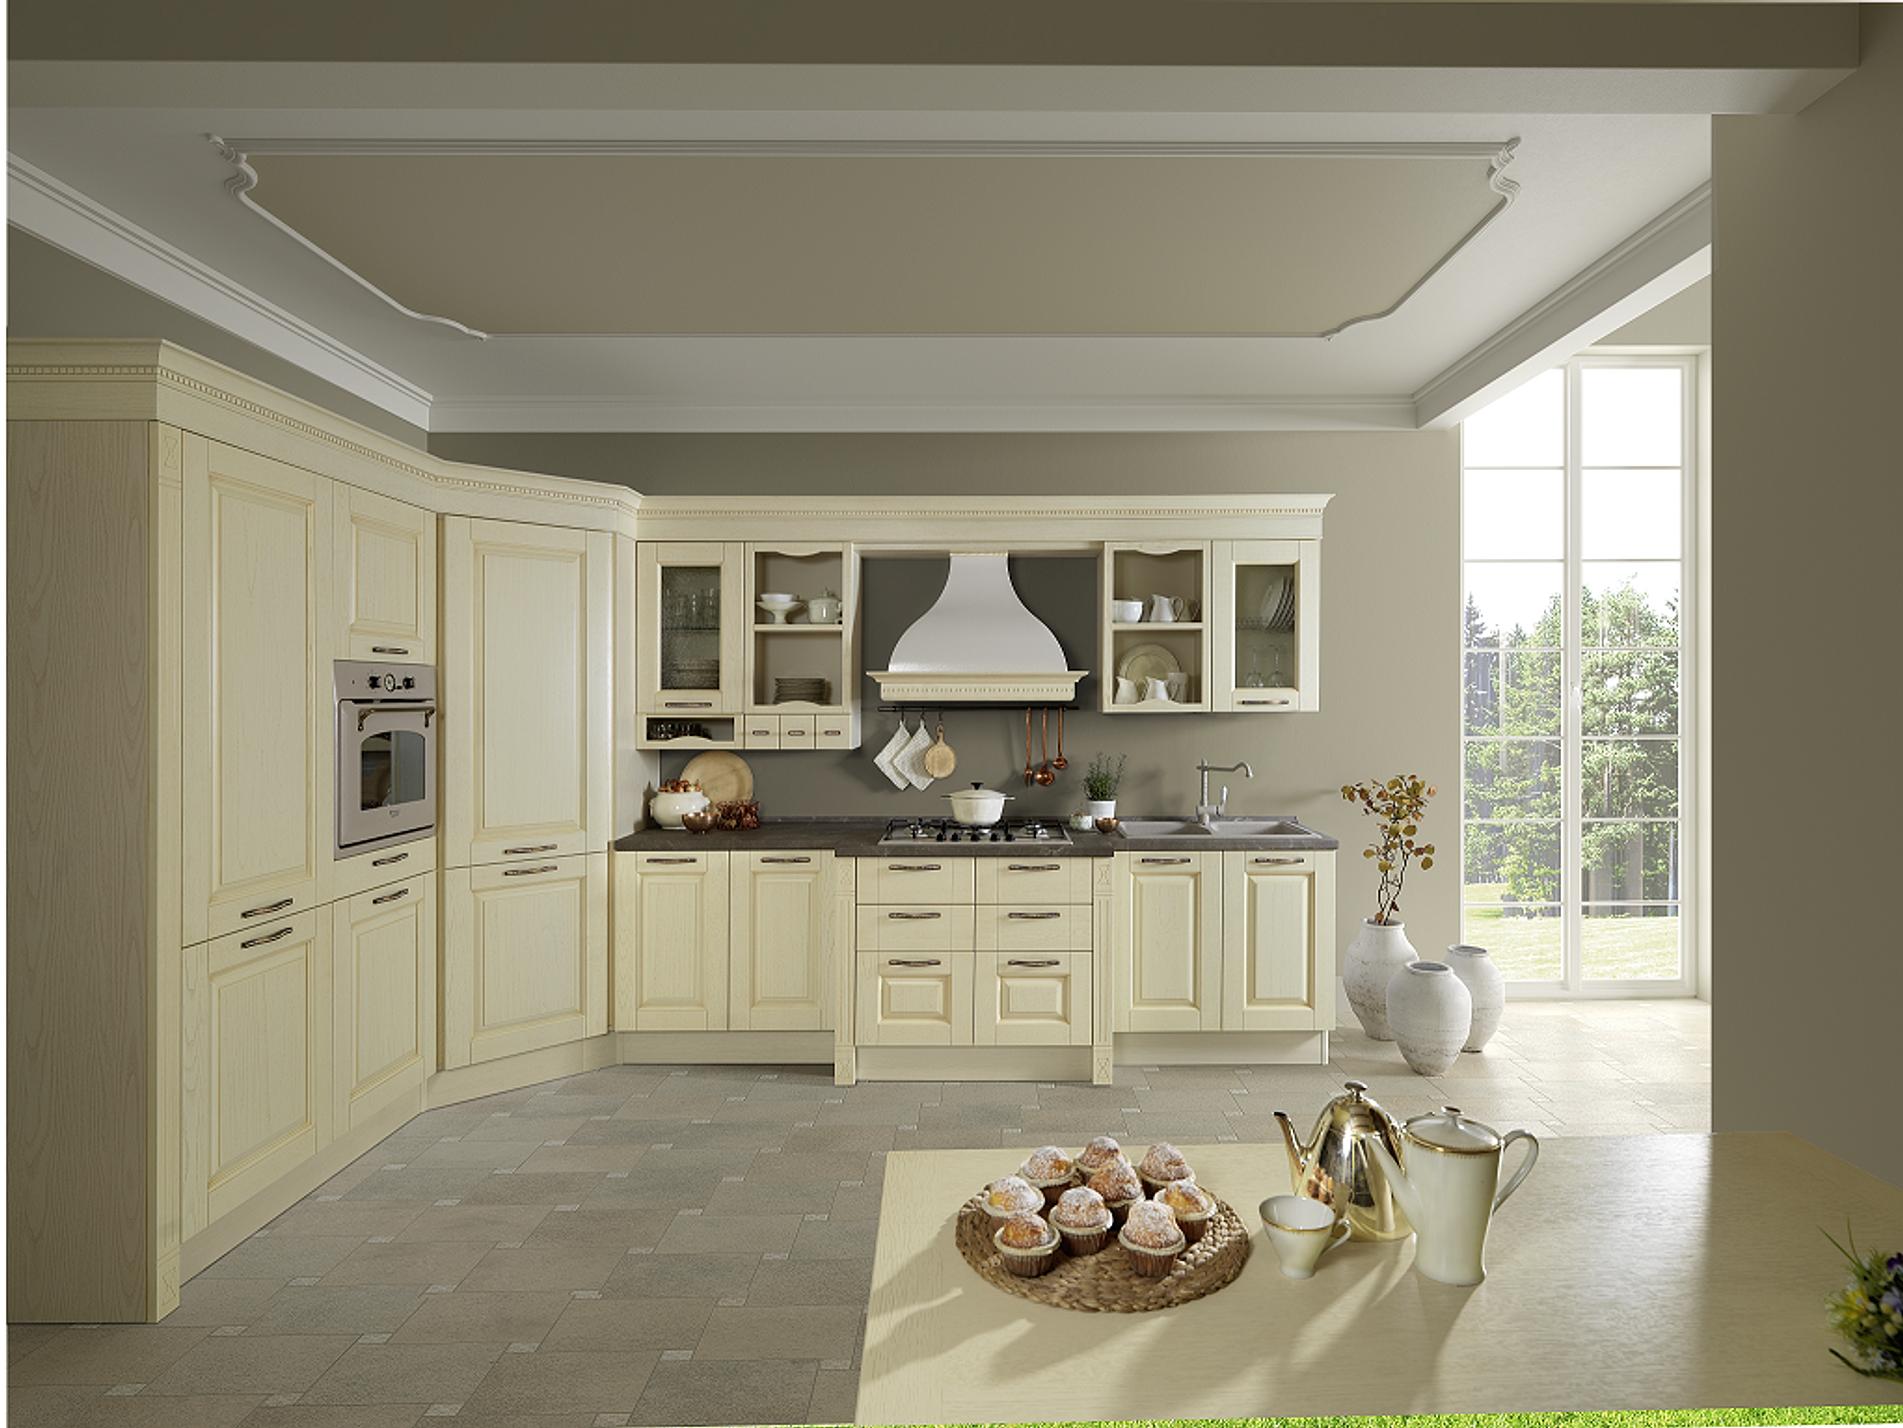 Stunning Cucine Ala Prezzi Photos - acrylicgiftware.us ...